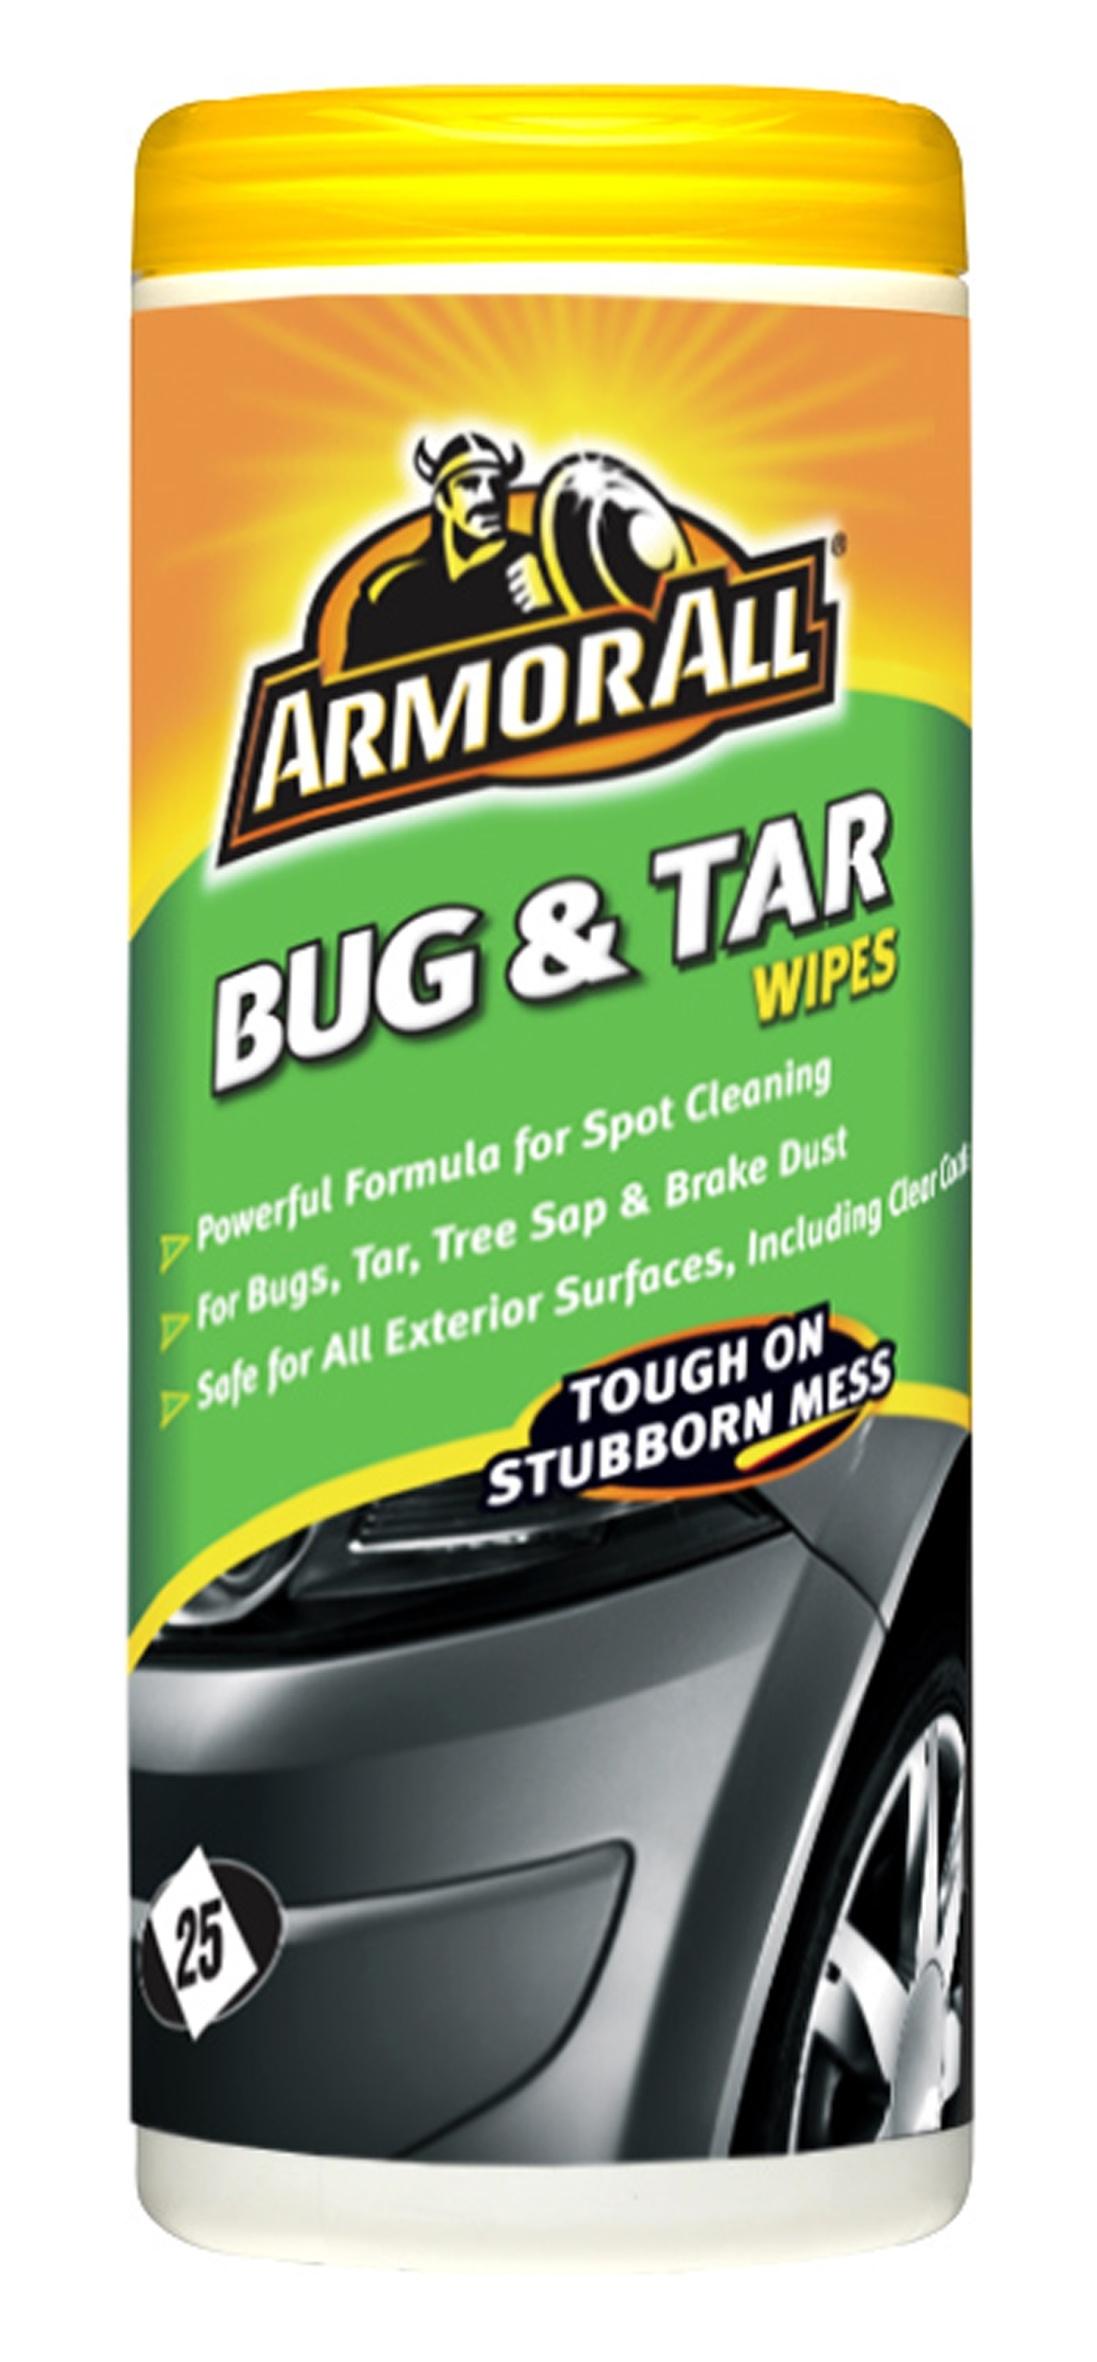 thompsons ltd armorall clo75025en car cleaning detailing bug shifer wipes single. Black Bedroom Furniture Sets. Home Design Ideas